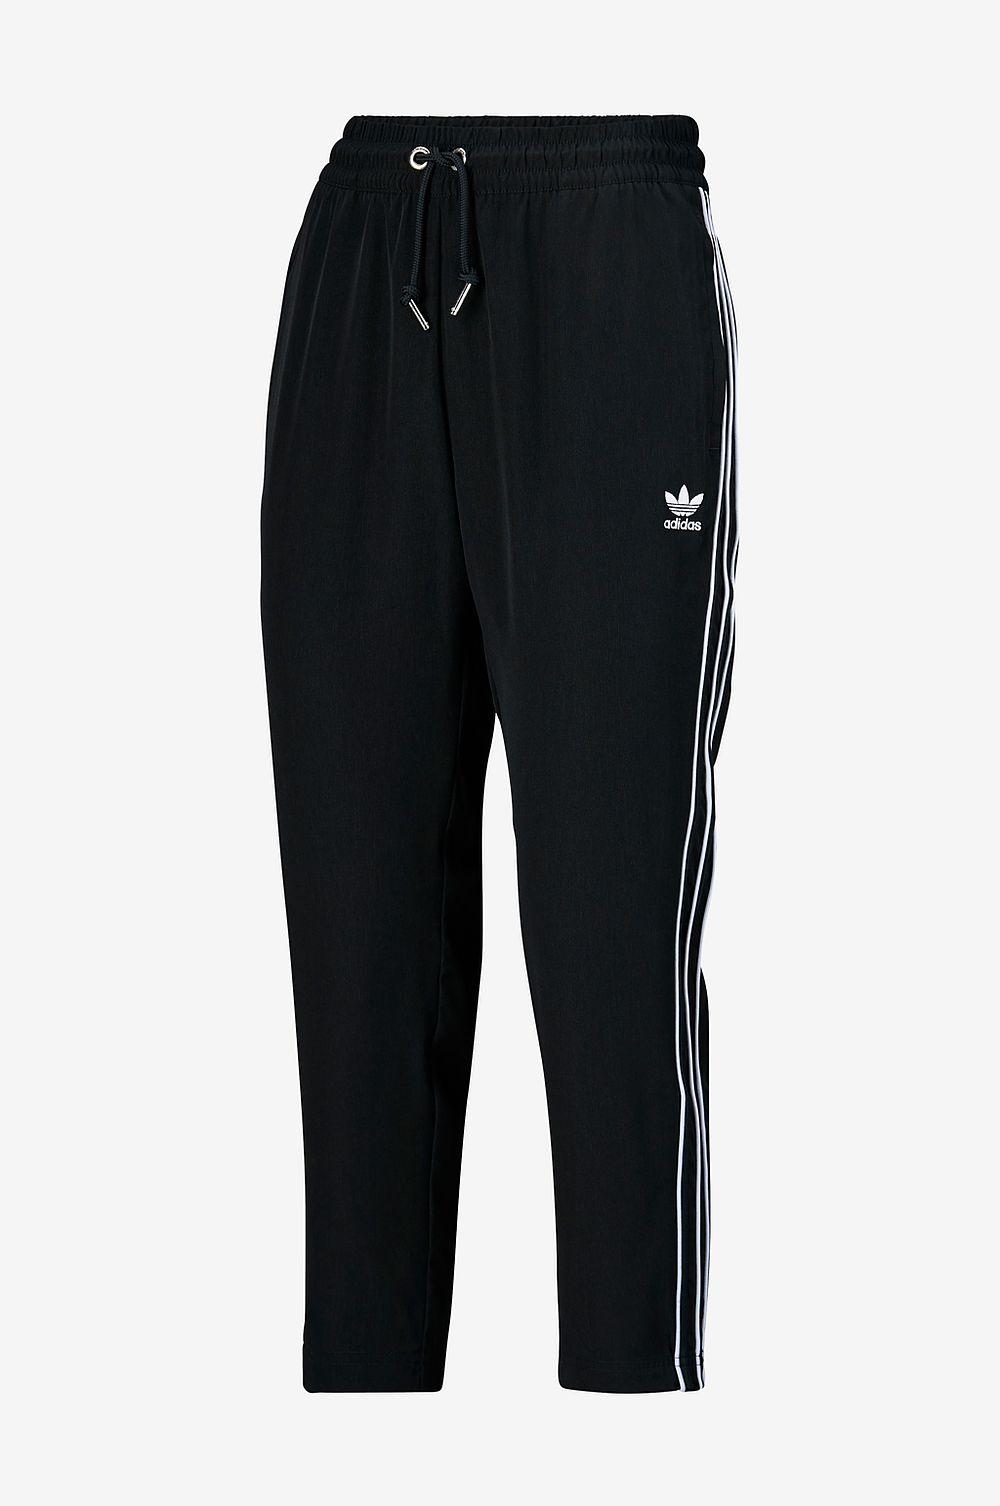 a47e6c8510b1 Adidas Originals Träningsbyxor Styling Complements Cropped Pants - Svart -  Dam